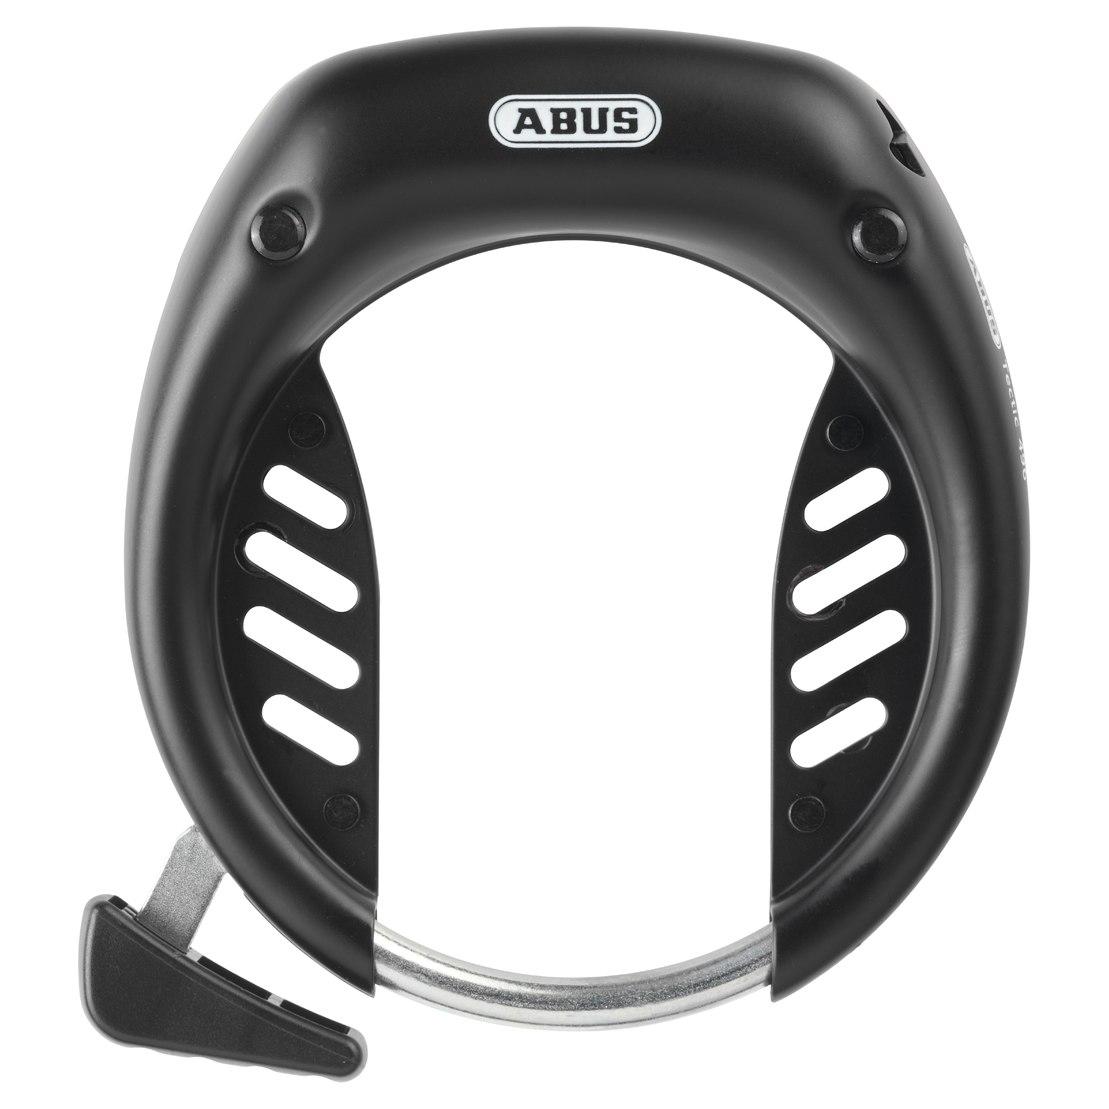 ABUS Tectic 496 Frame Lock